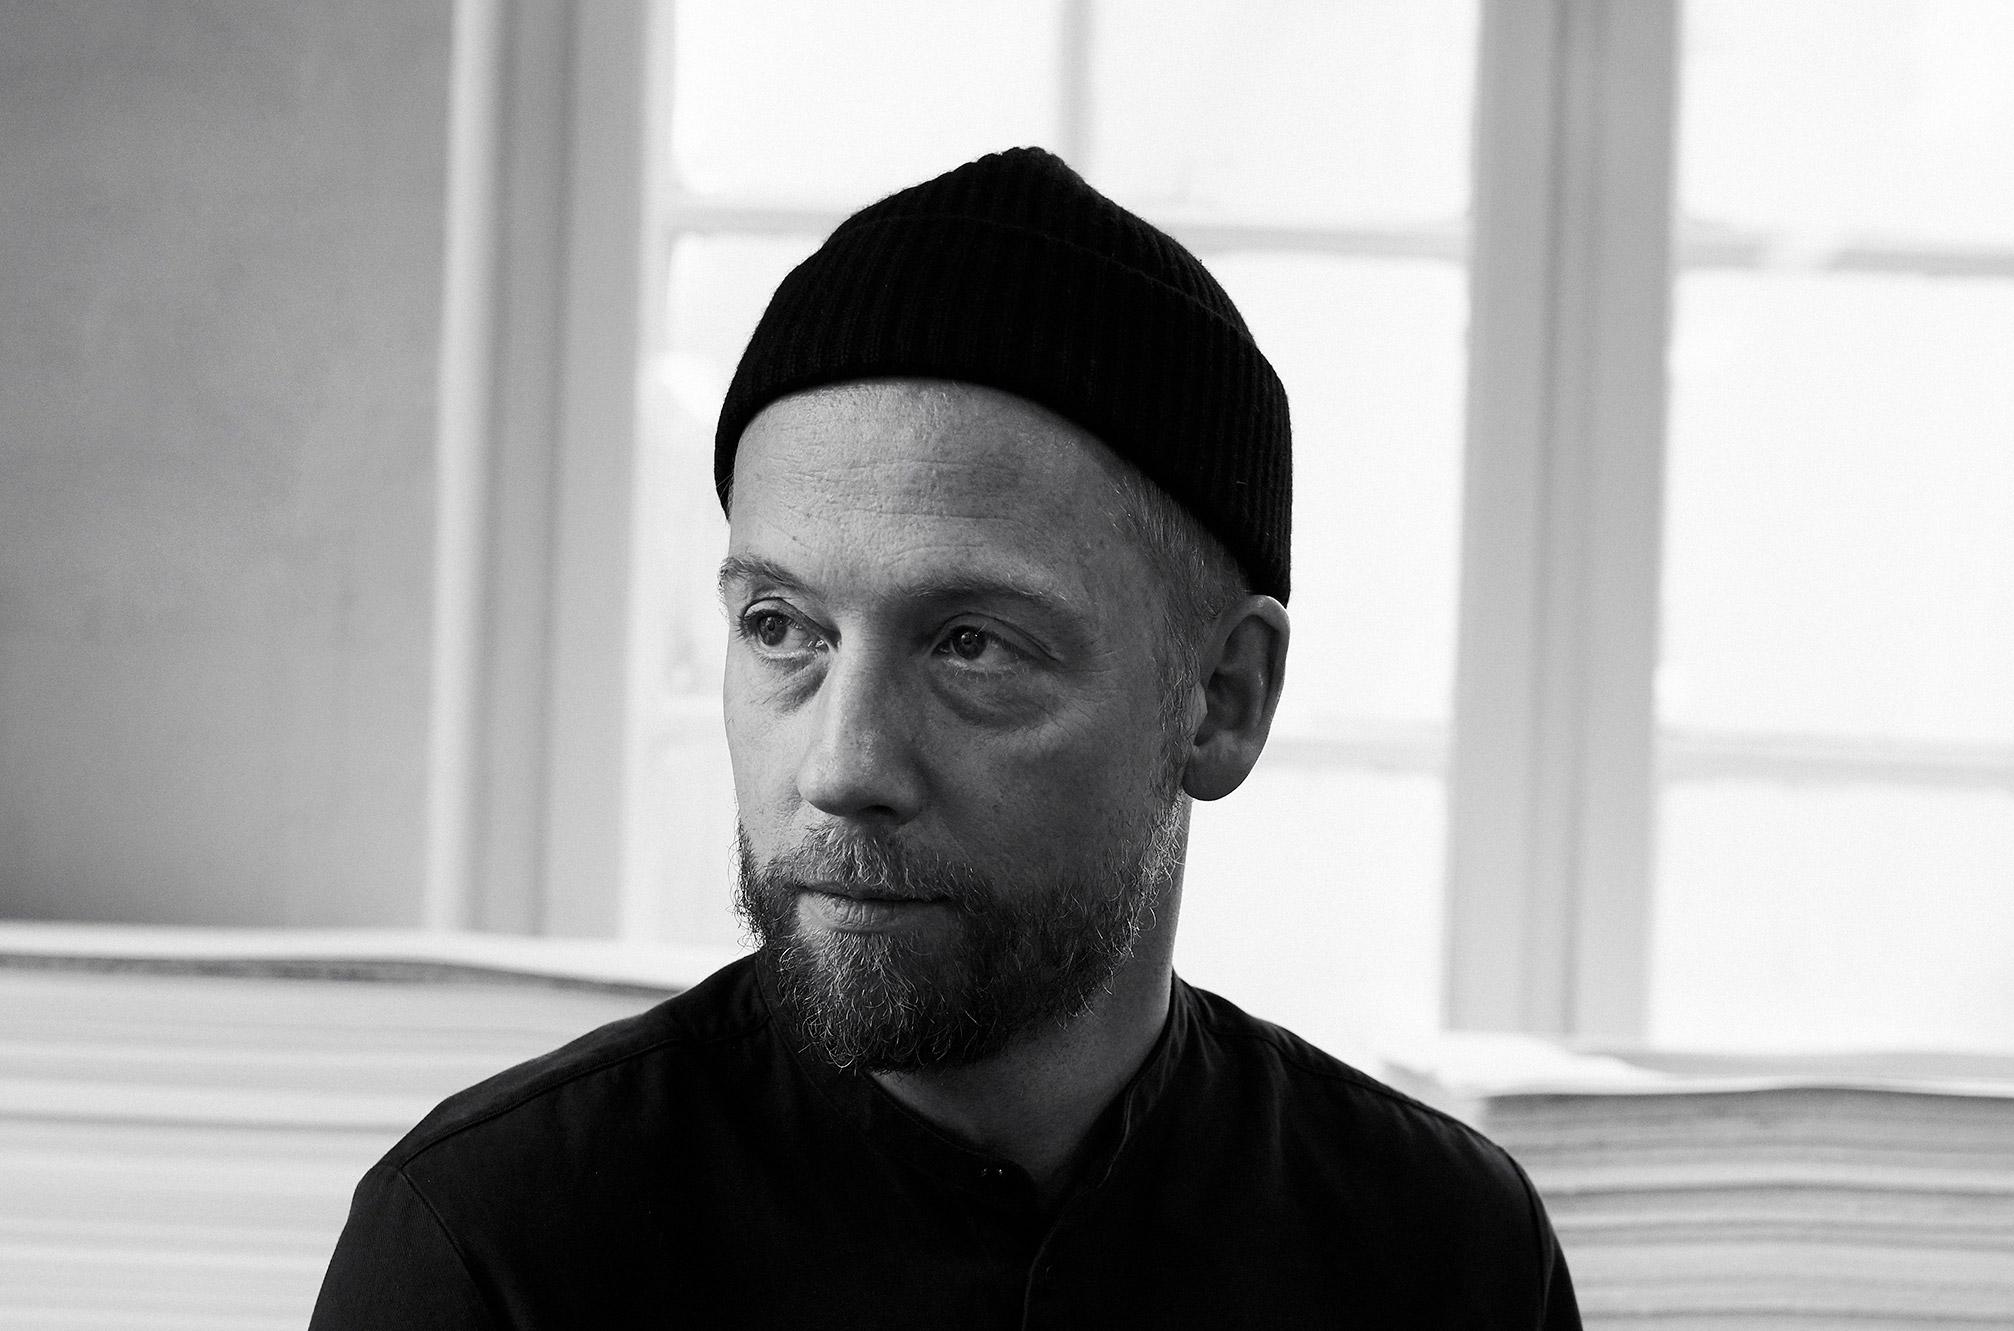 Kasper Eistrup